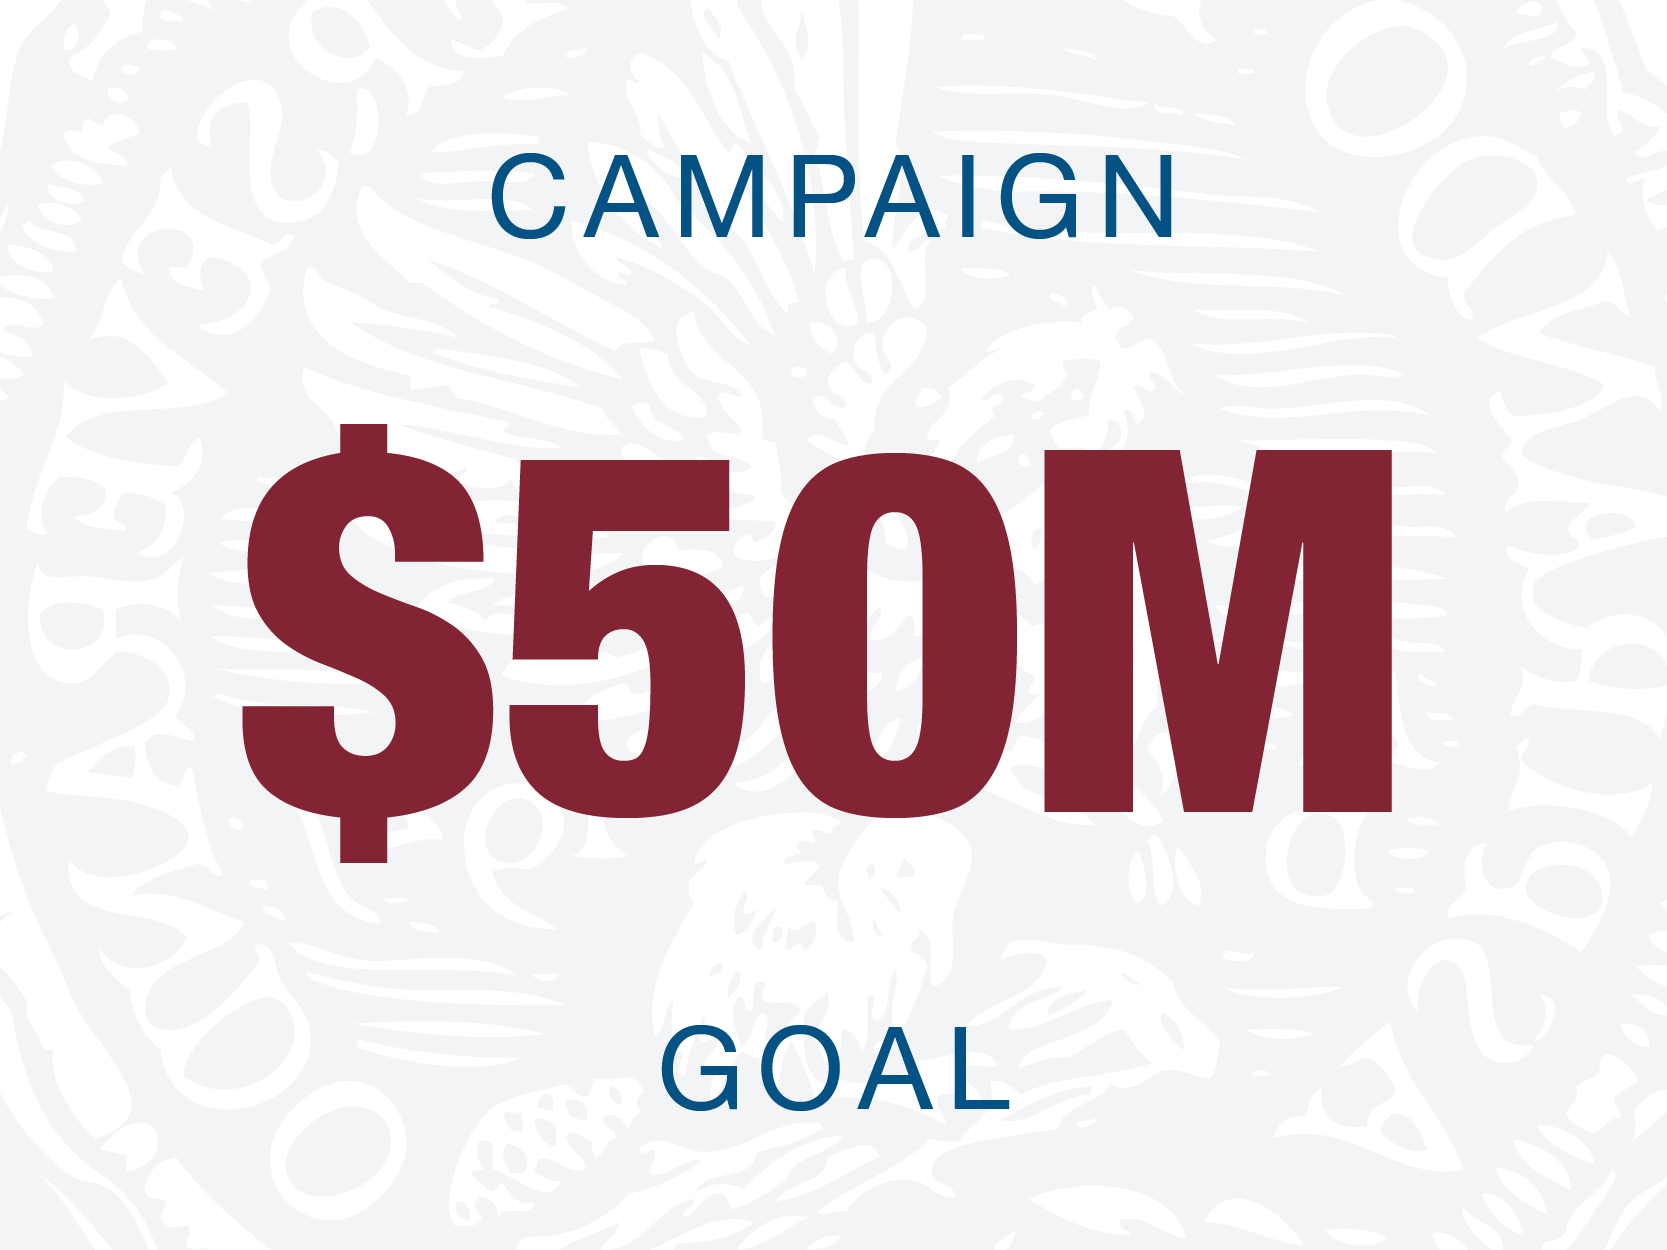 campaign goal webgraphic